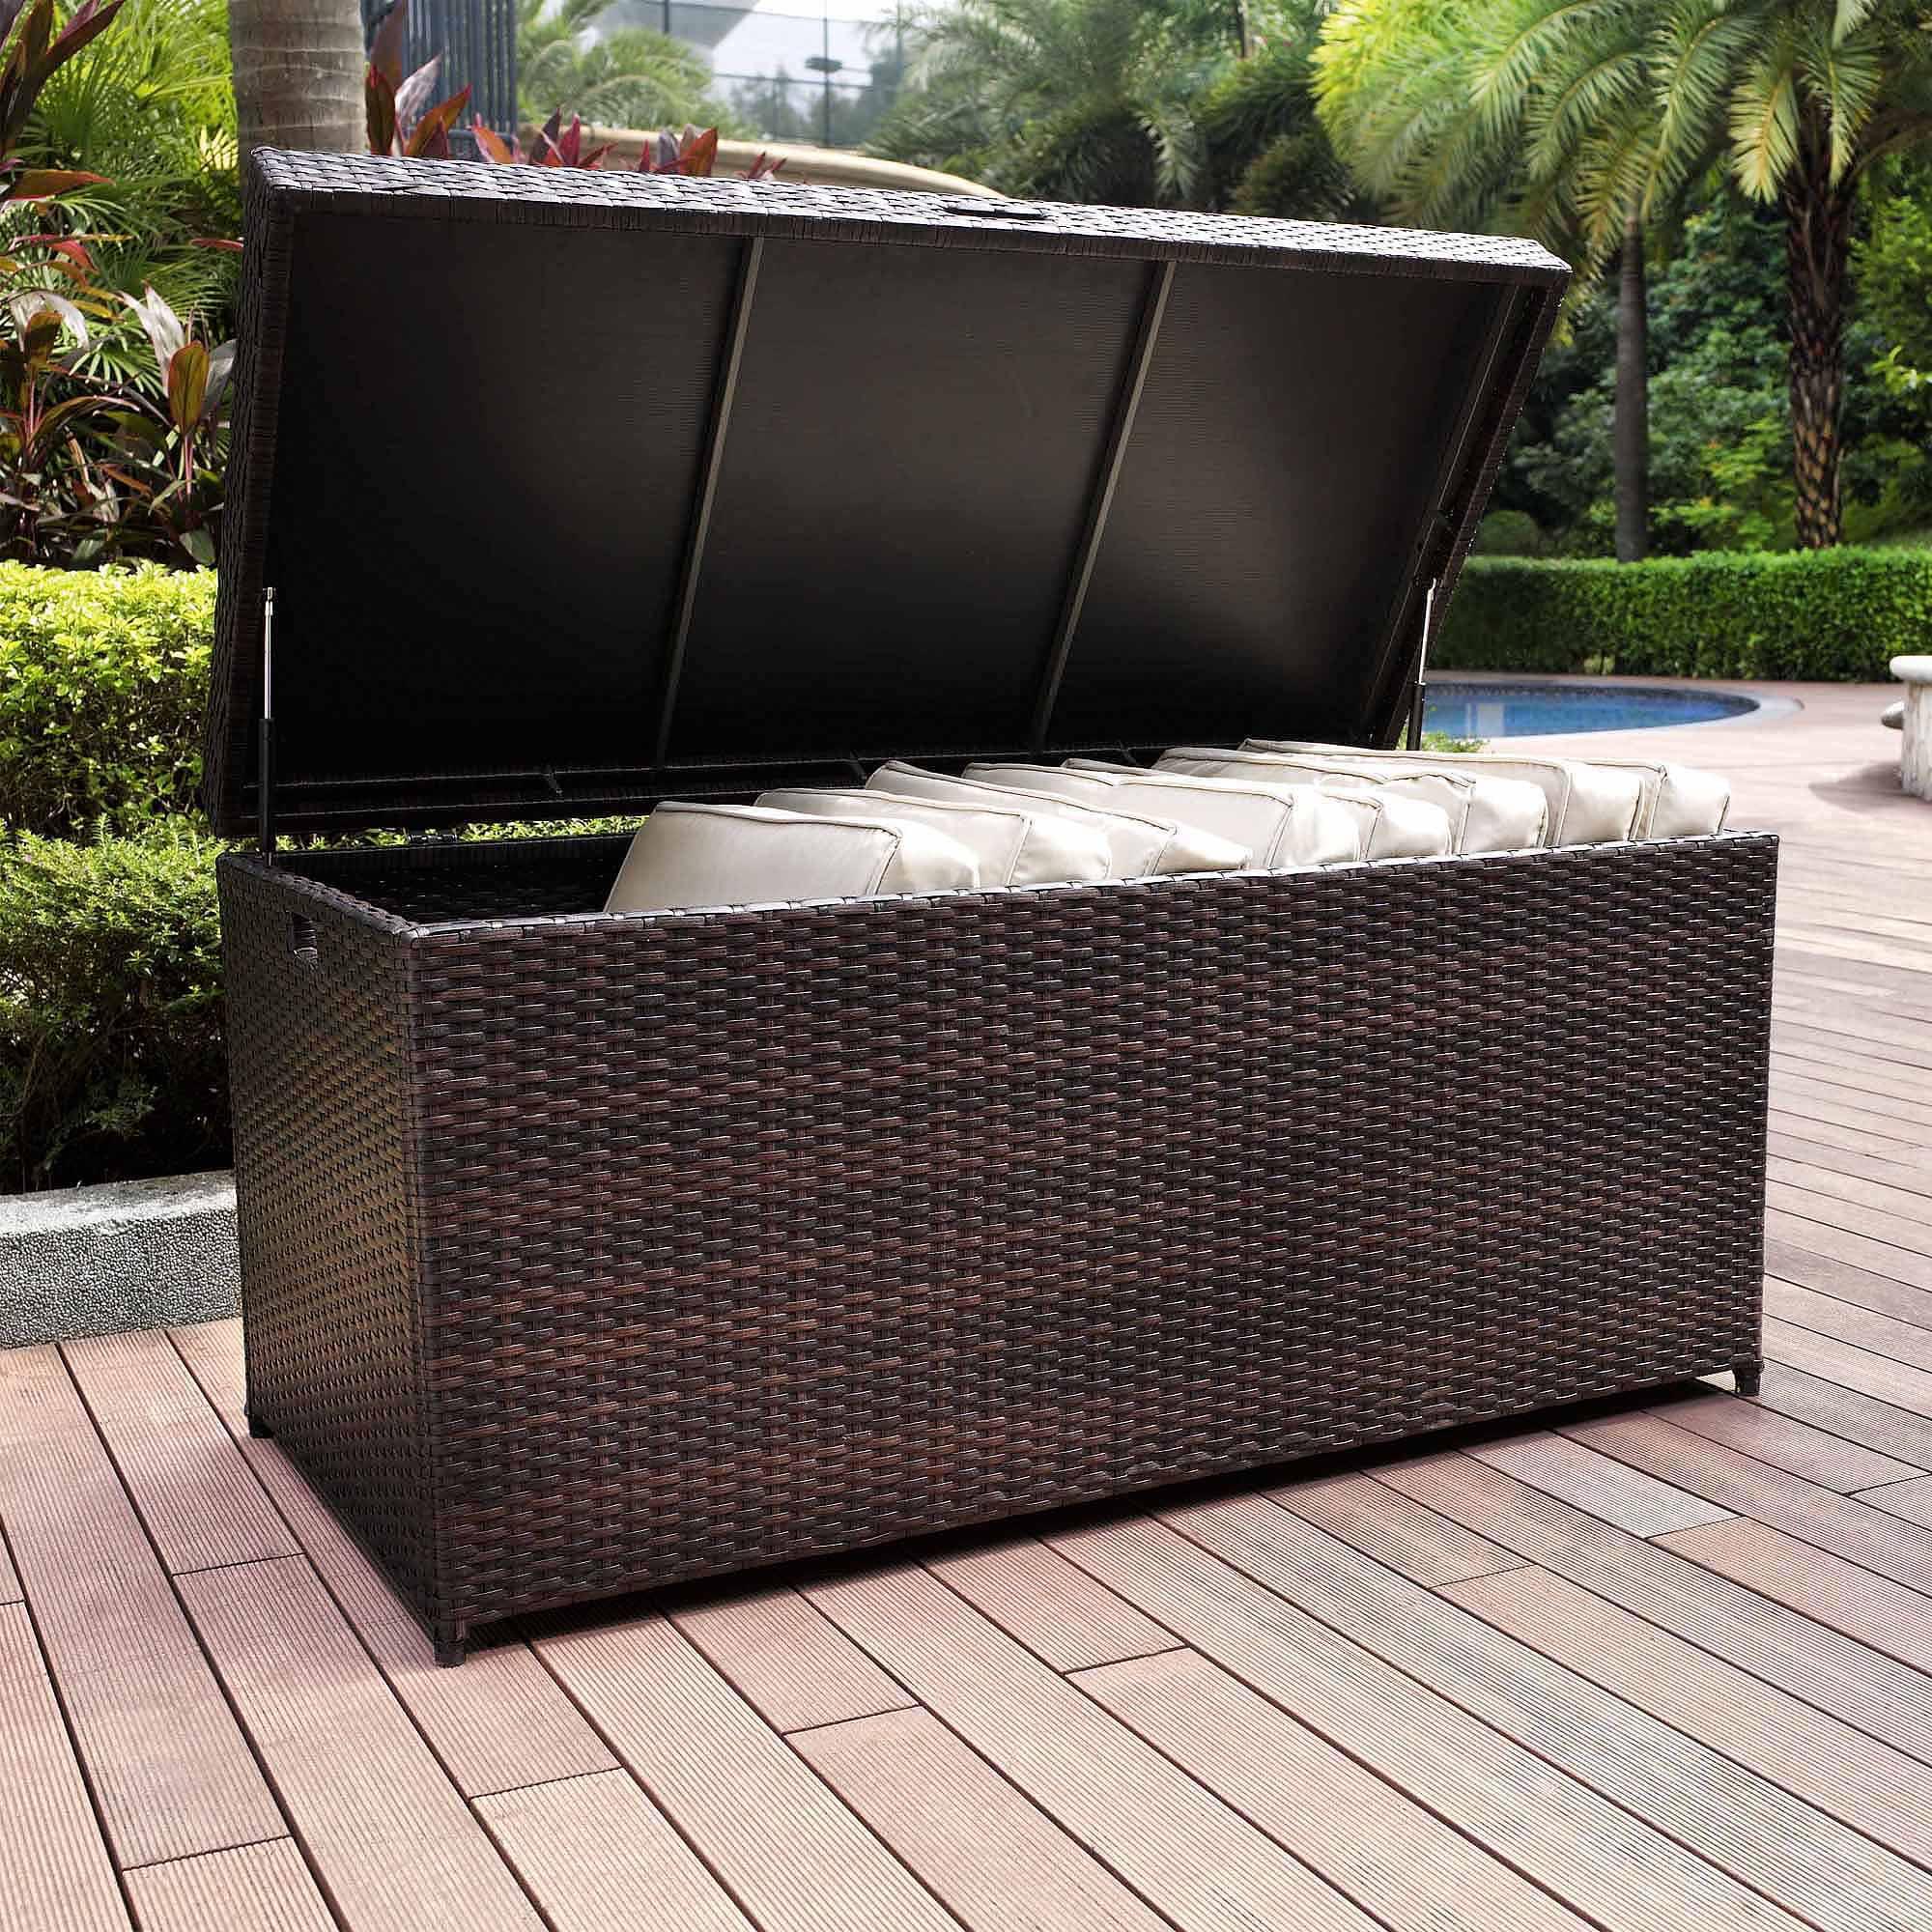 design satisfying wooden klupa od deck kitchen storage bench backyard paleta sam ideas uradi box new outdoor cabinets